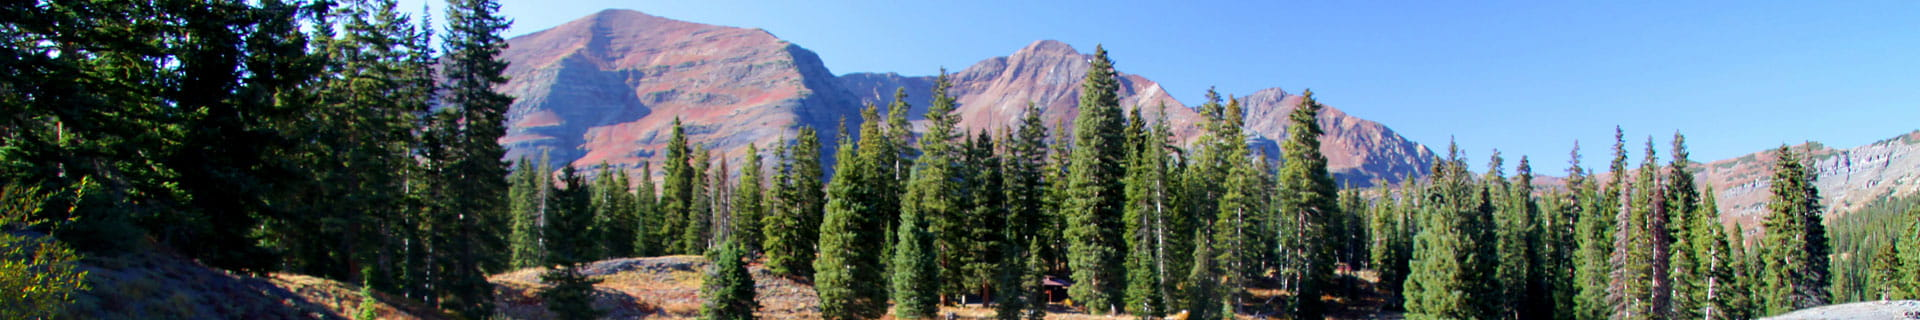 pine trees set before mountain peaks